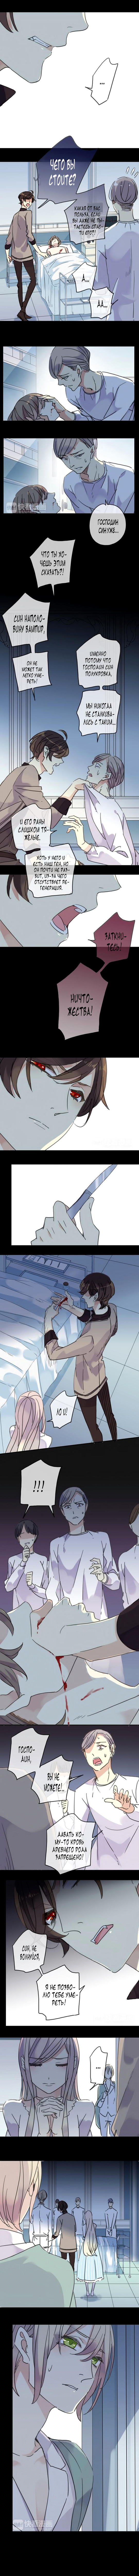 https://r1.ninemanga.com/comics/pic2/45/32237/434450/1536582291983.jpg Page 4